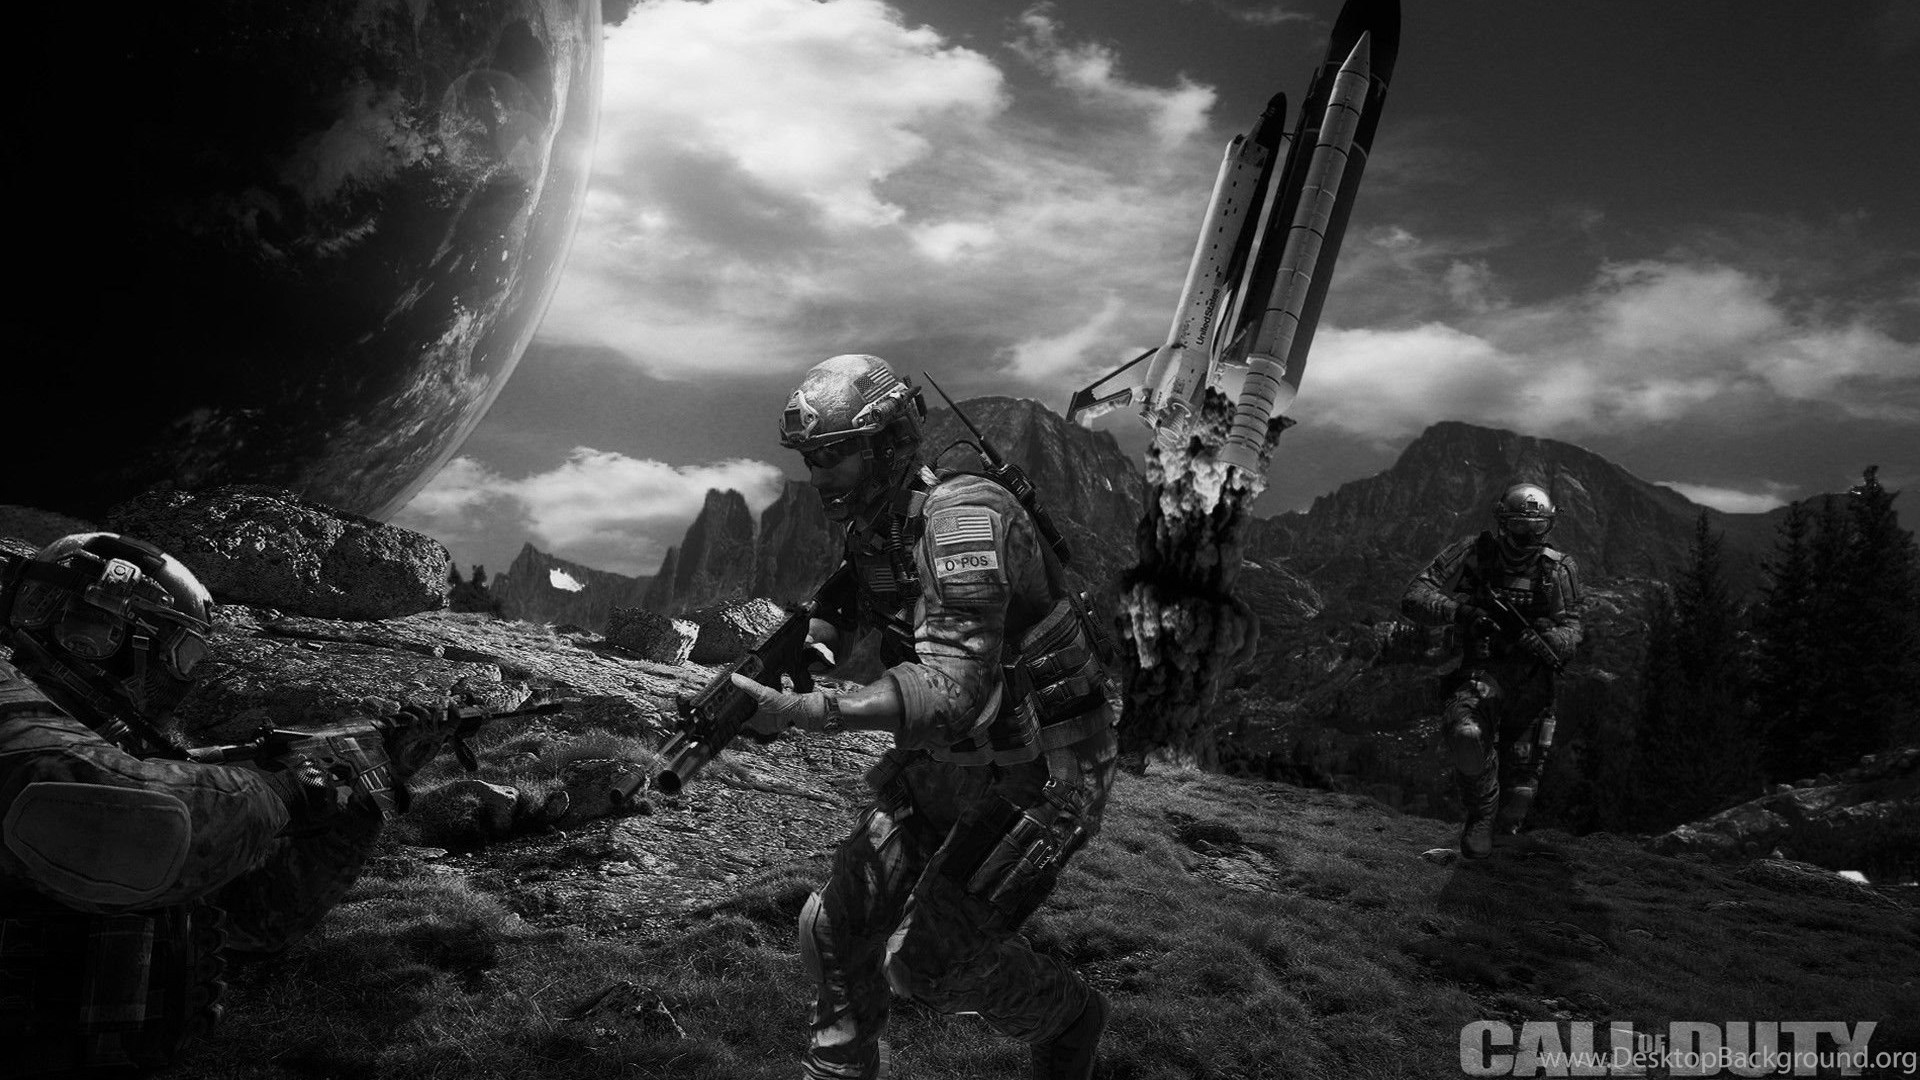 Call Of Duty Modern Warfare 3 Wallpapers Wallpapers Cave Desktop